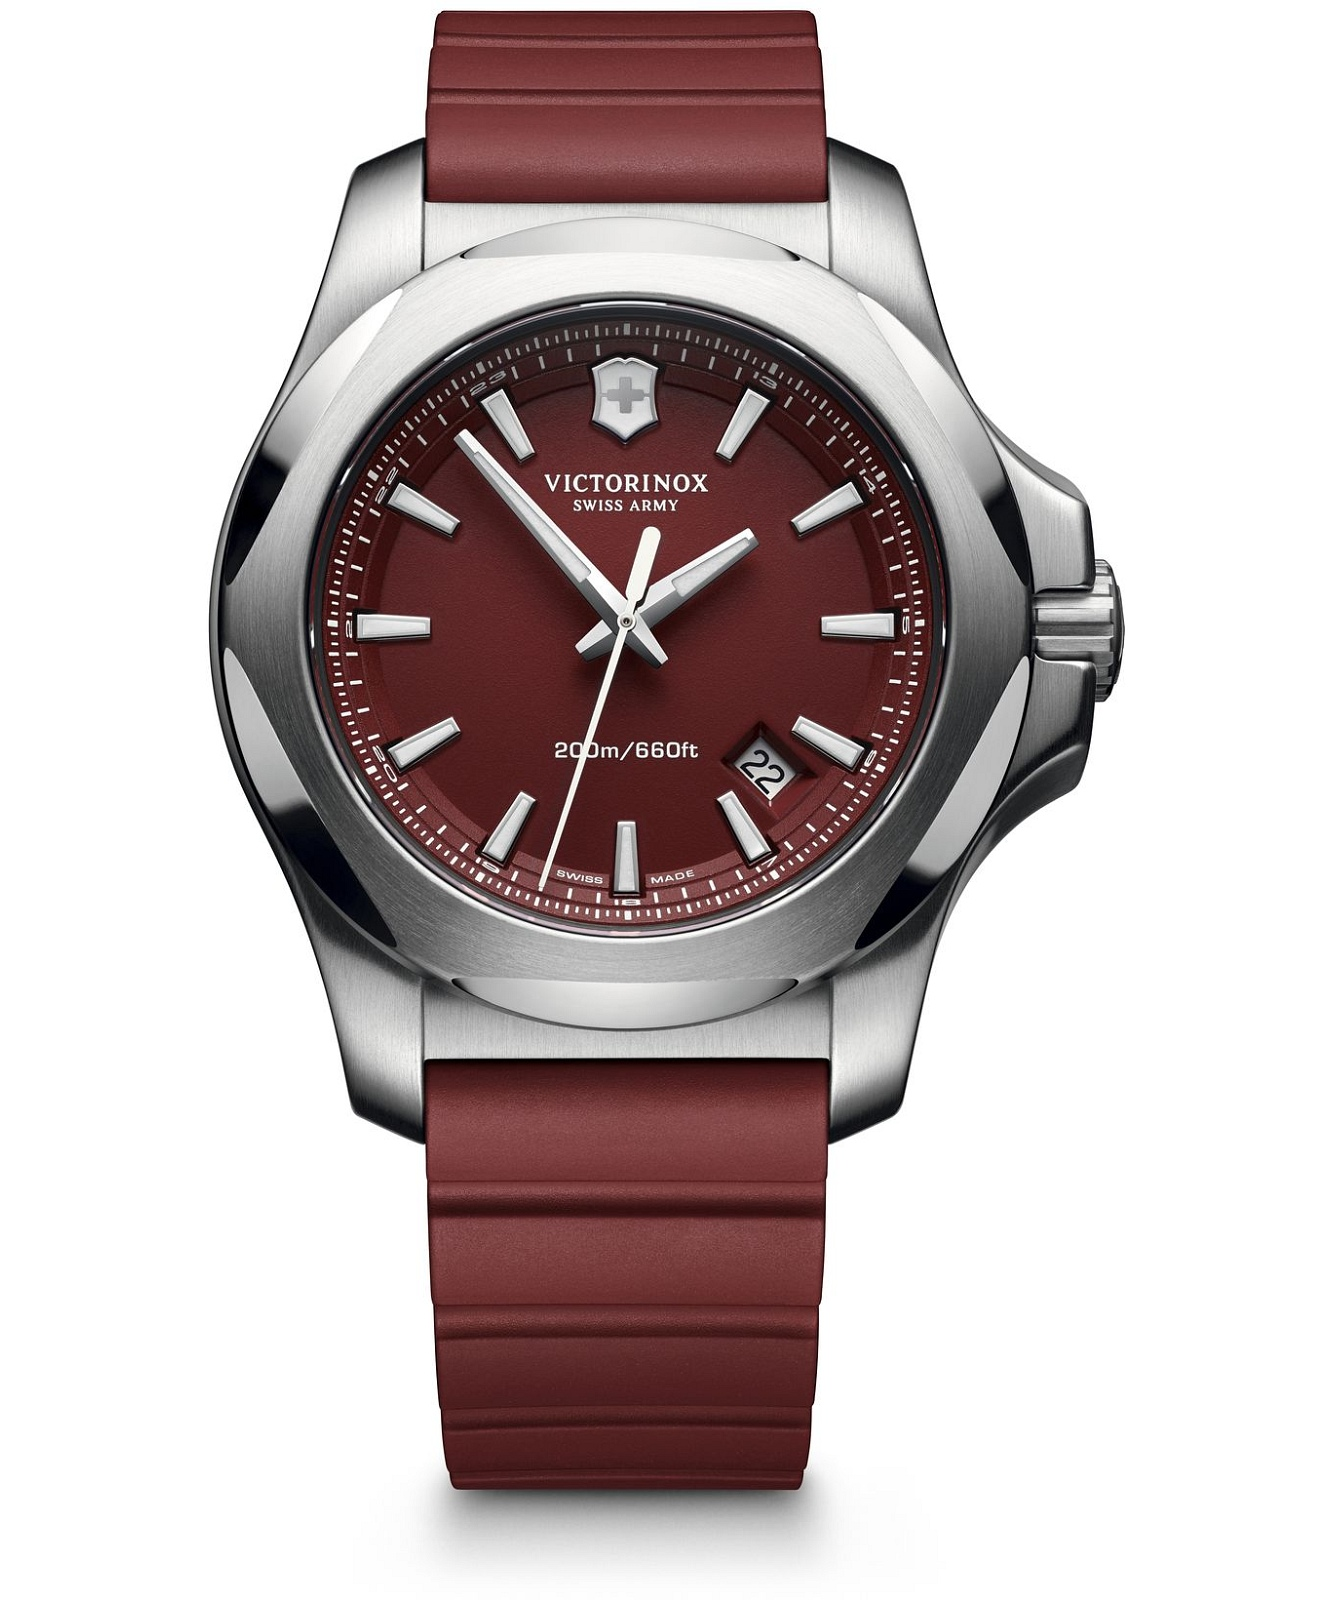 zegarek-meski-victorinox-i-n-o-x-rubber-241719-1